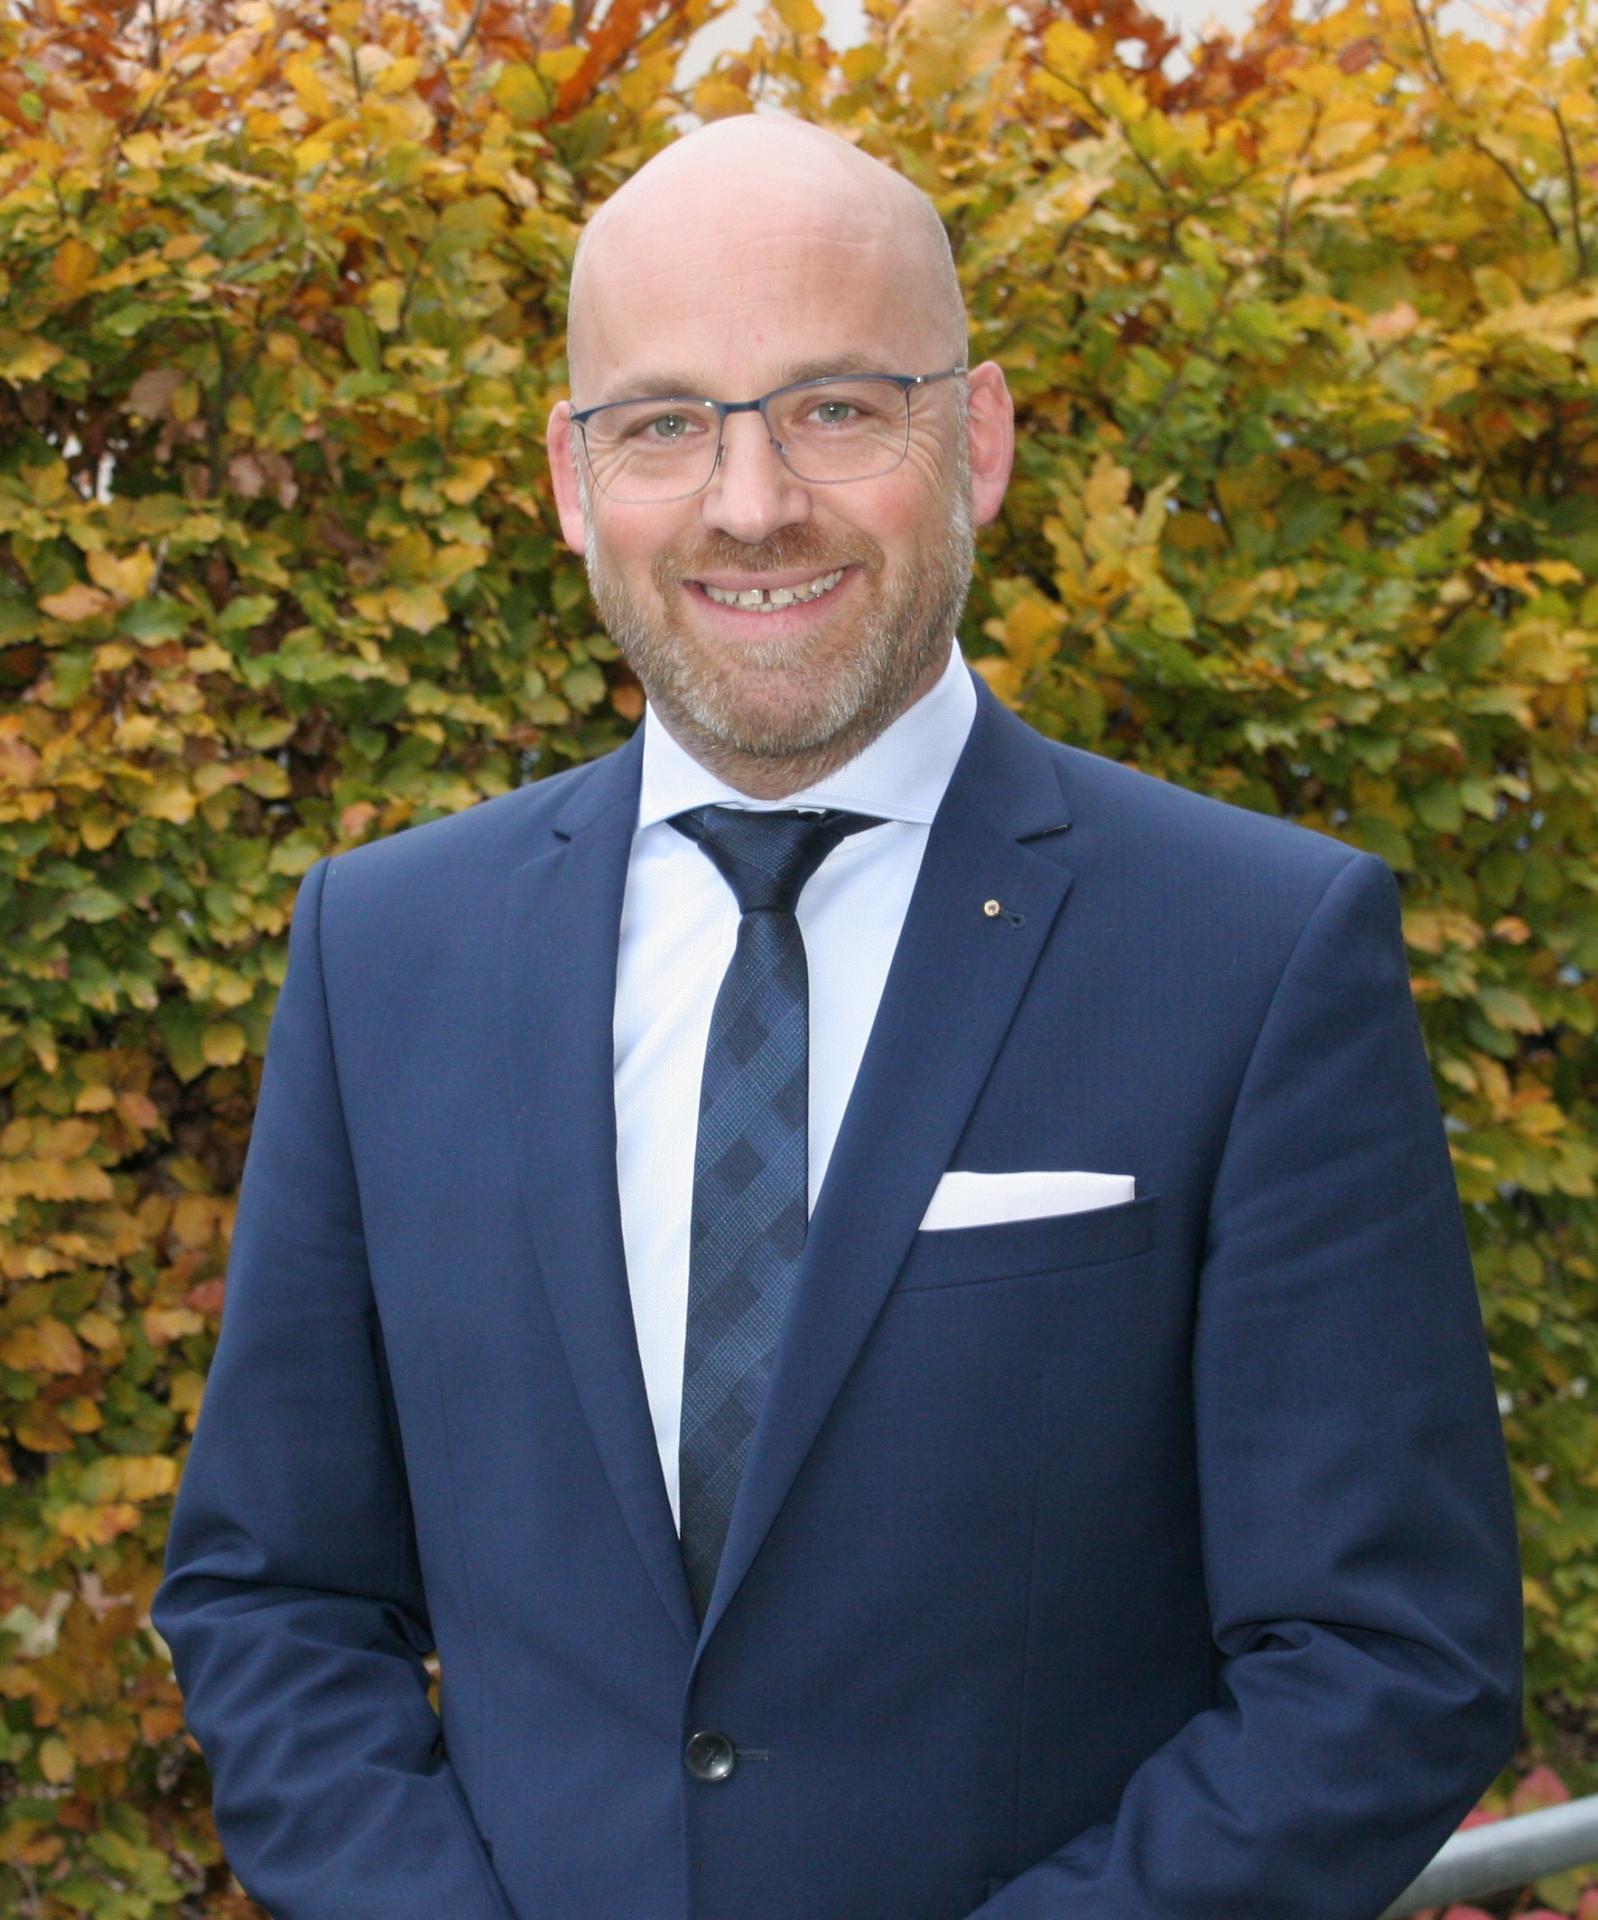 Carlo Focke